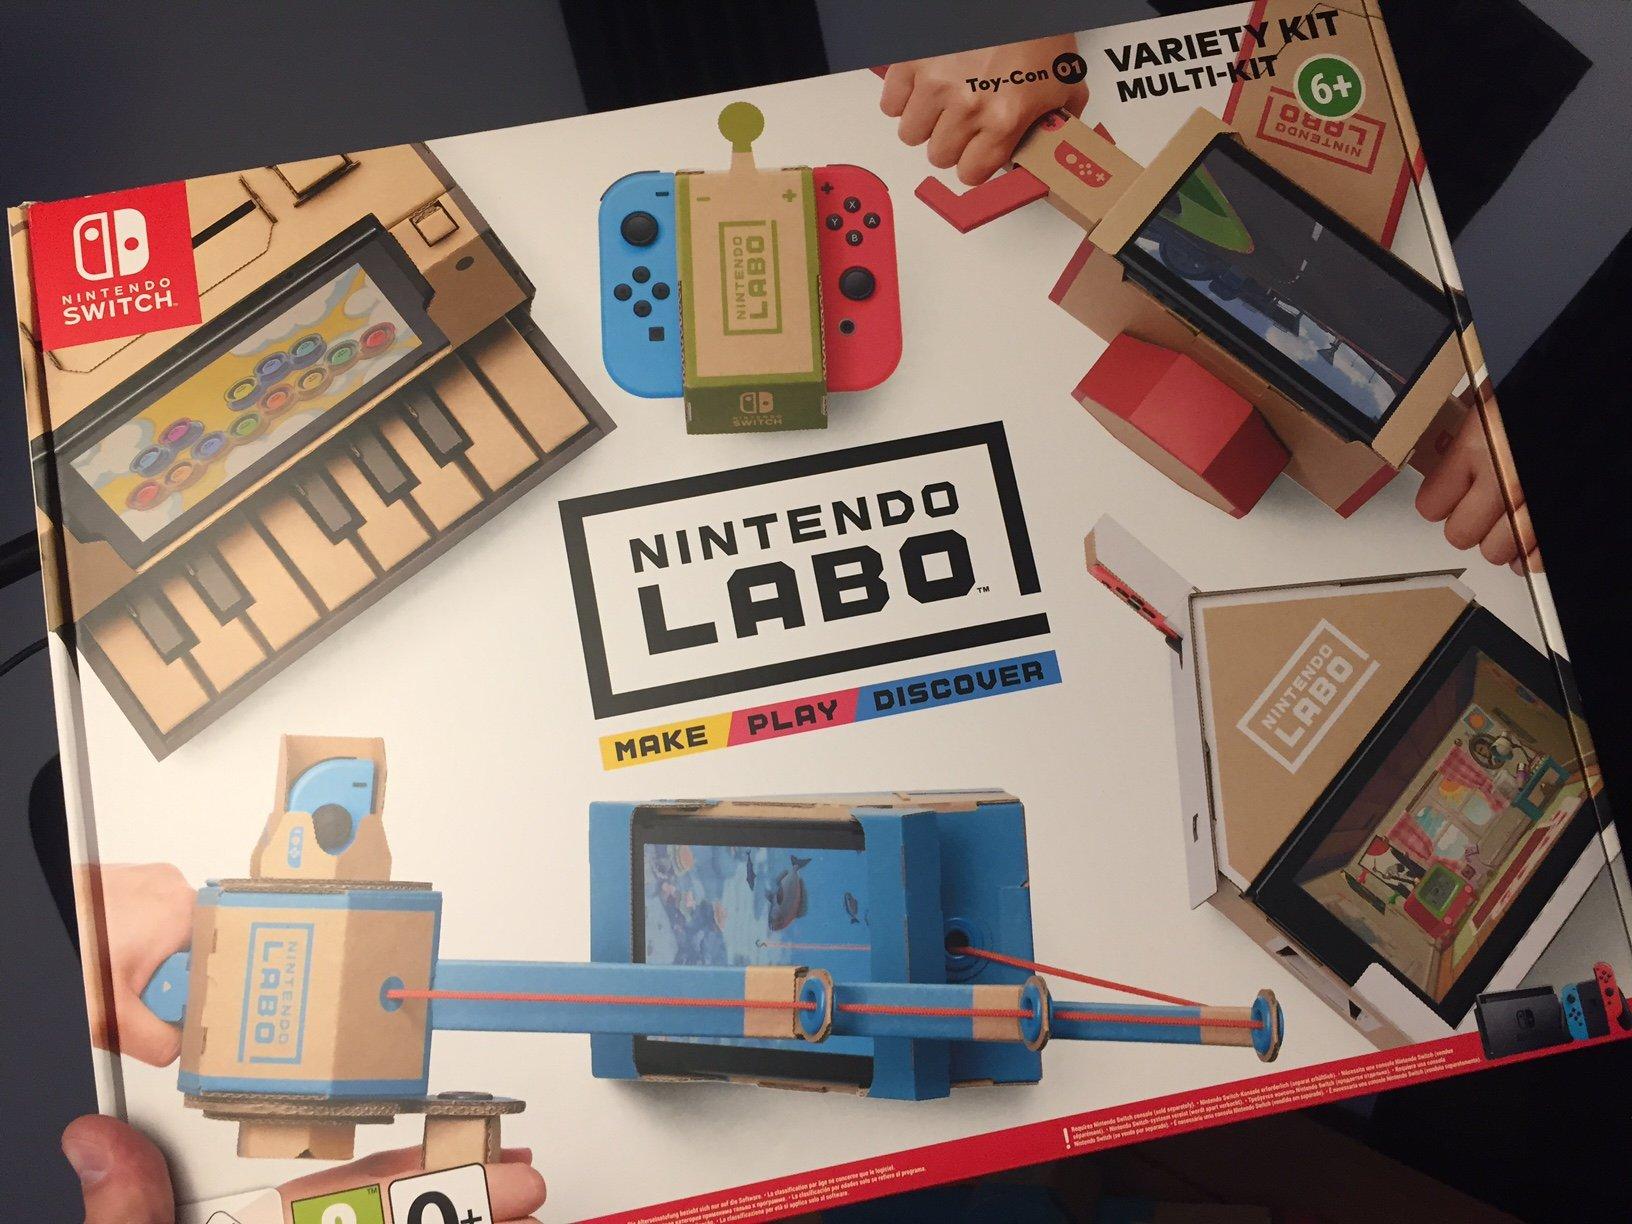 Nintendo Labo Обзор Review Нинтендо Лабо Variety Kit Набор Ассорти